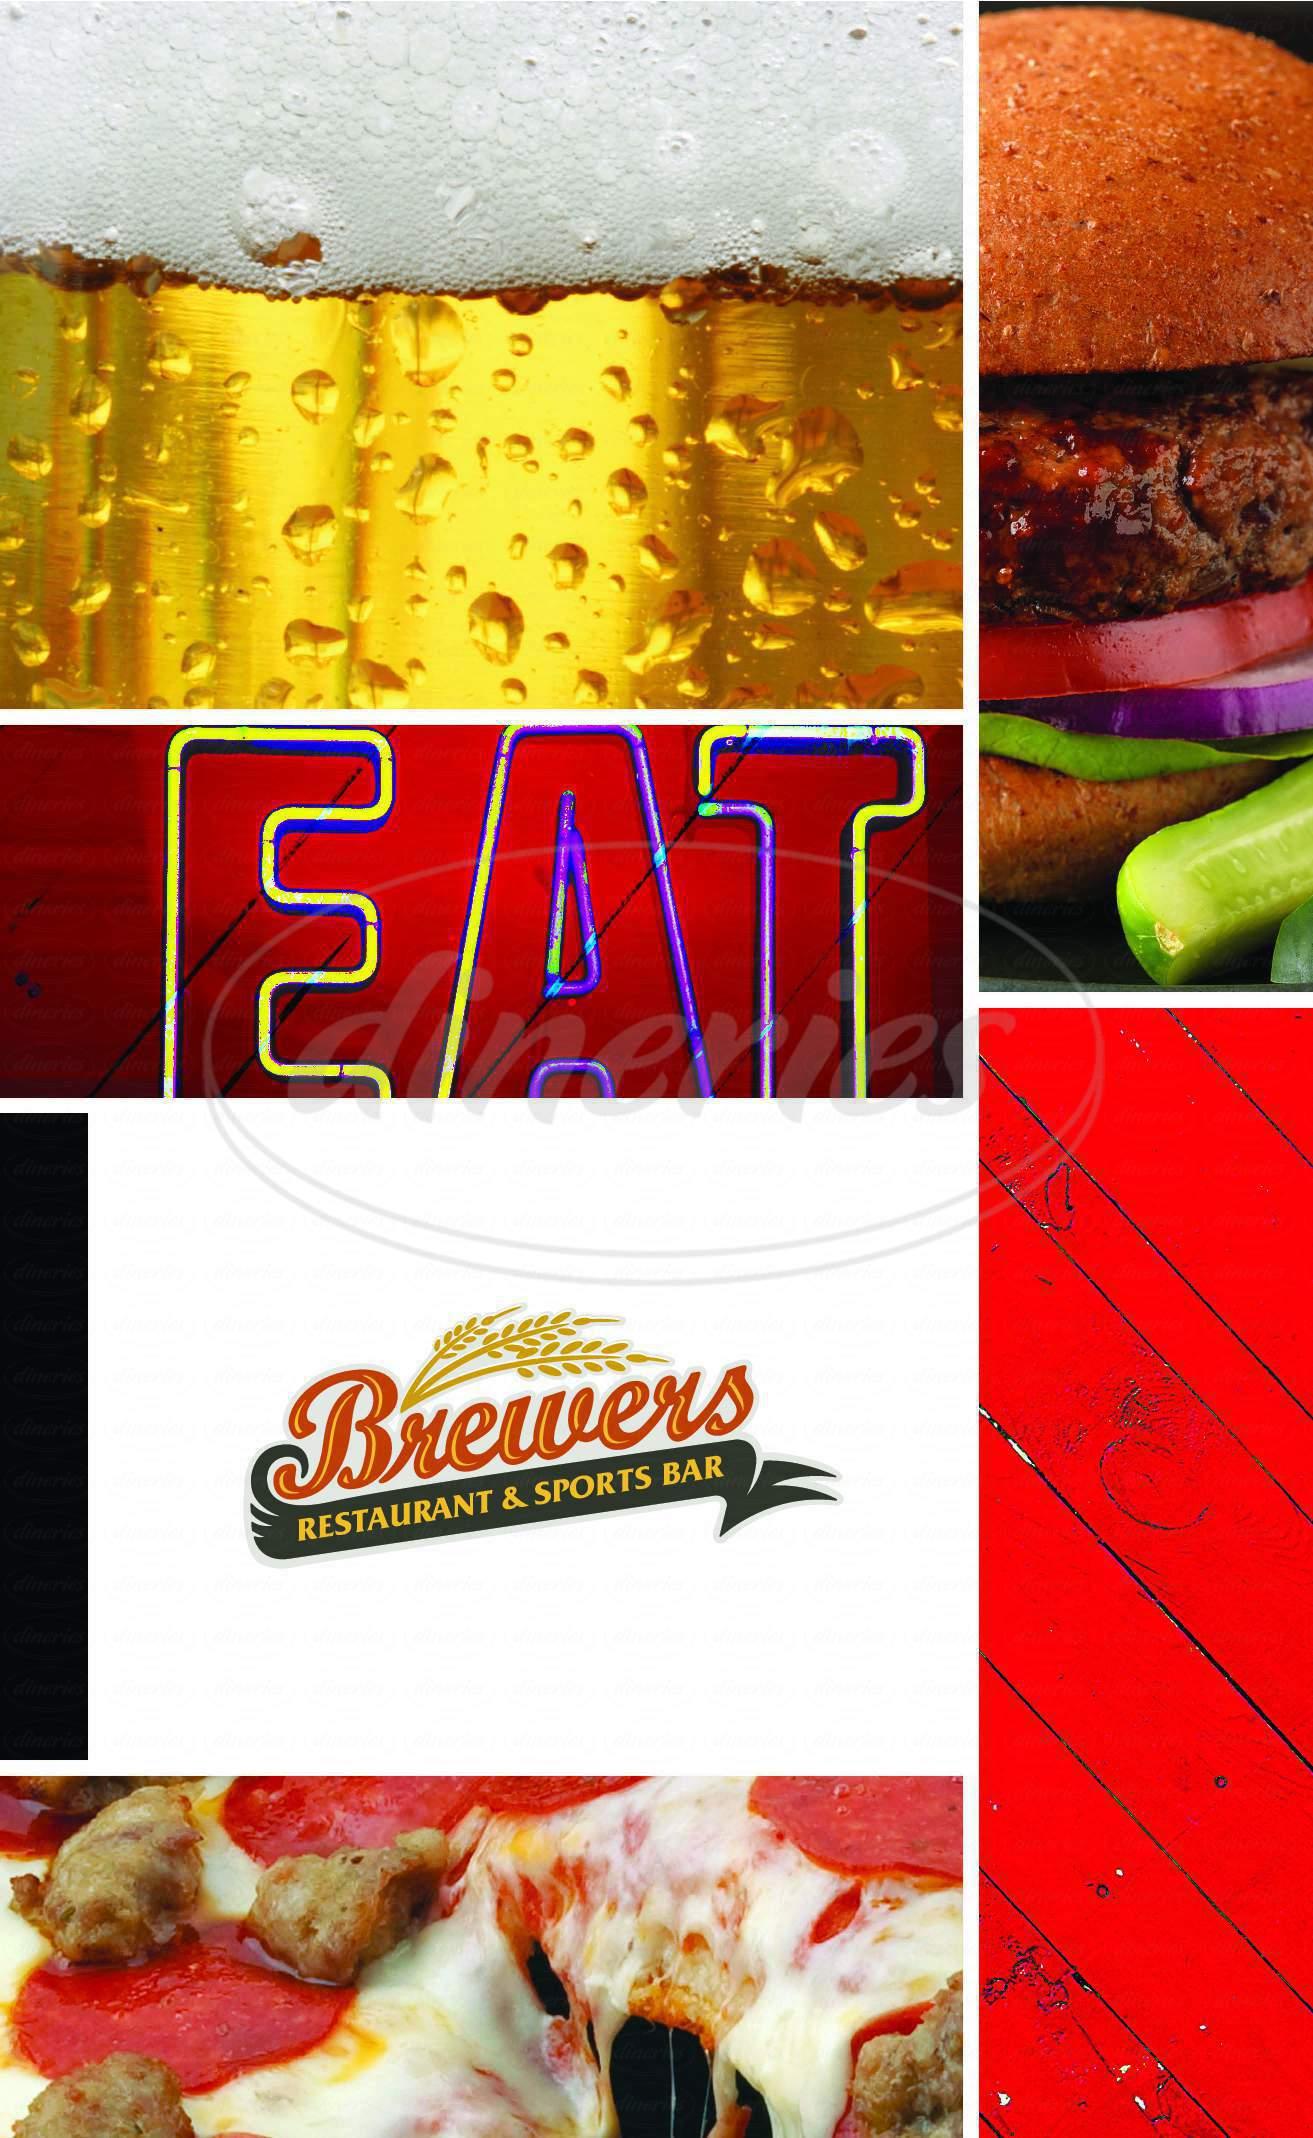 menu for Brewers Restaurant & Sports Bar